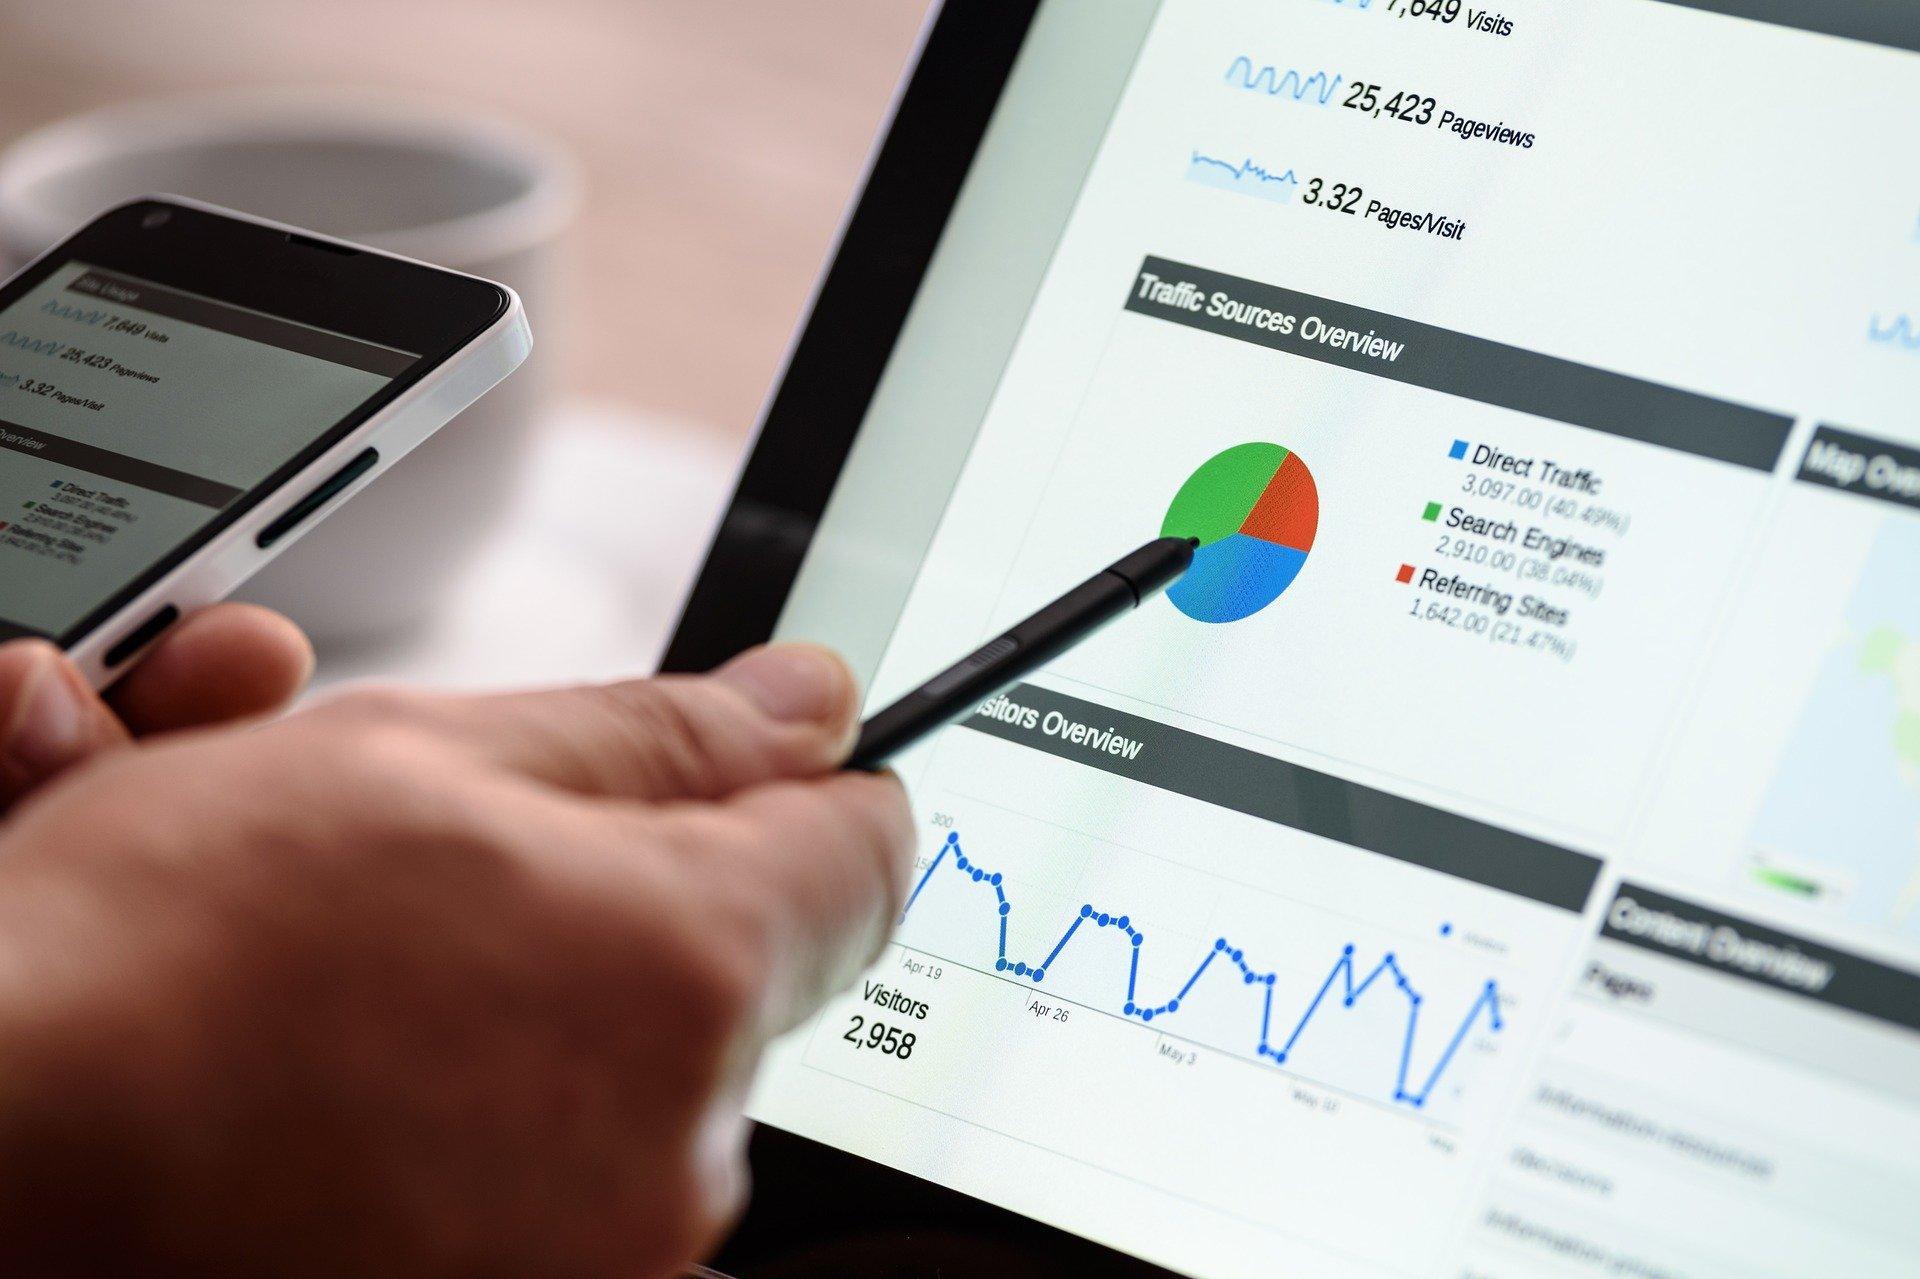 SEO - تحليل موقع الويب مع خطة تحسين خاصة لمحركات البحث